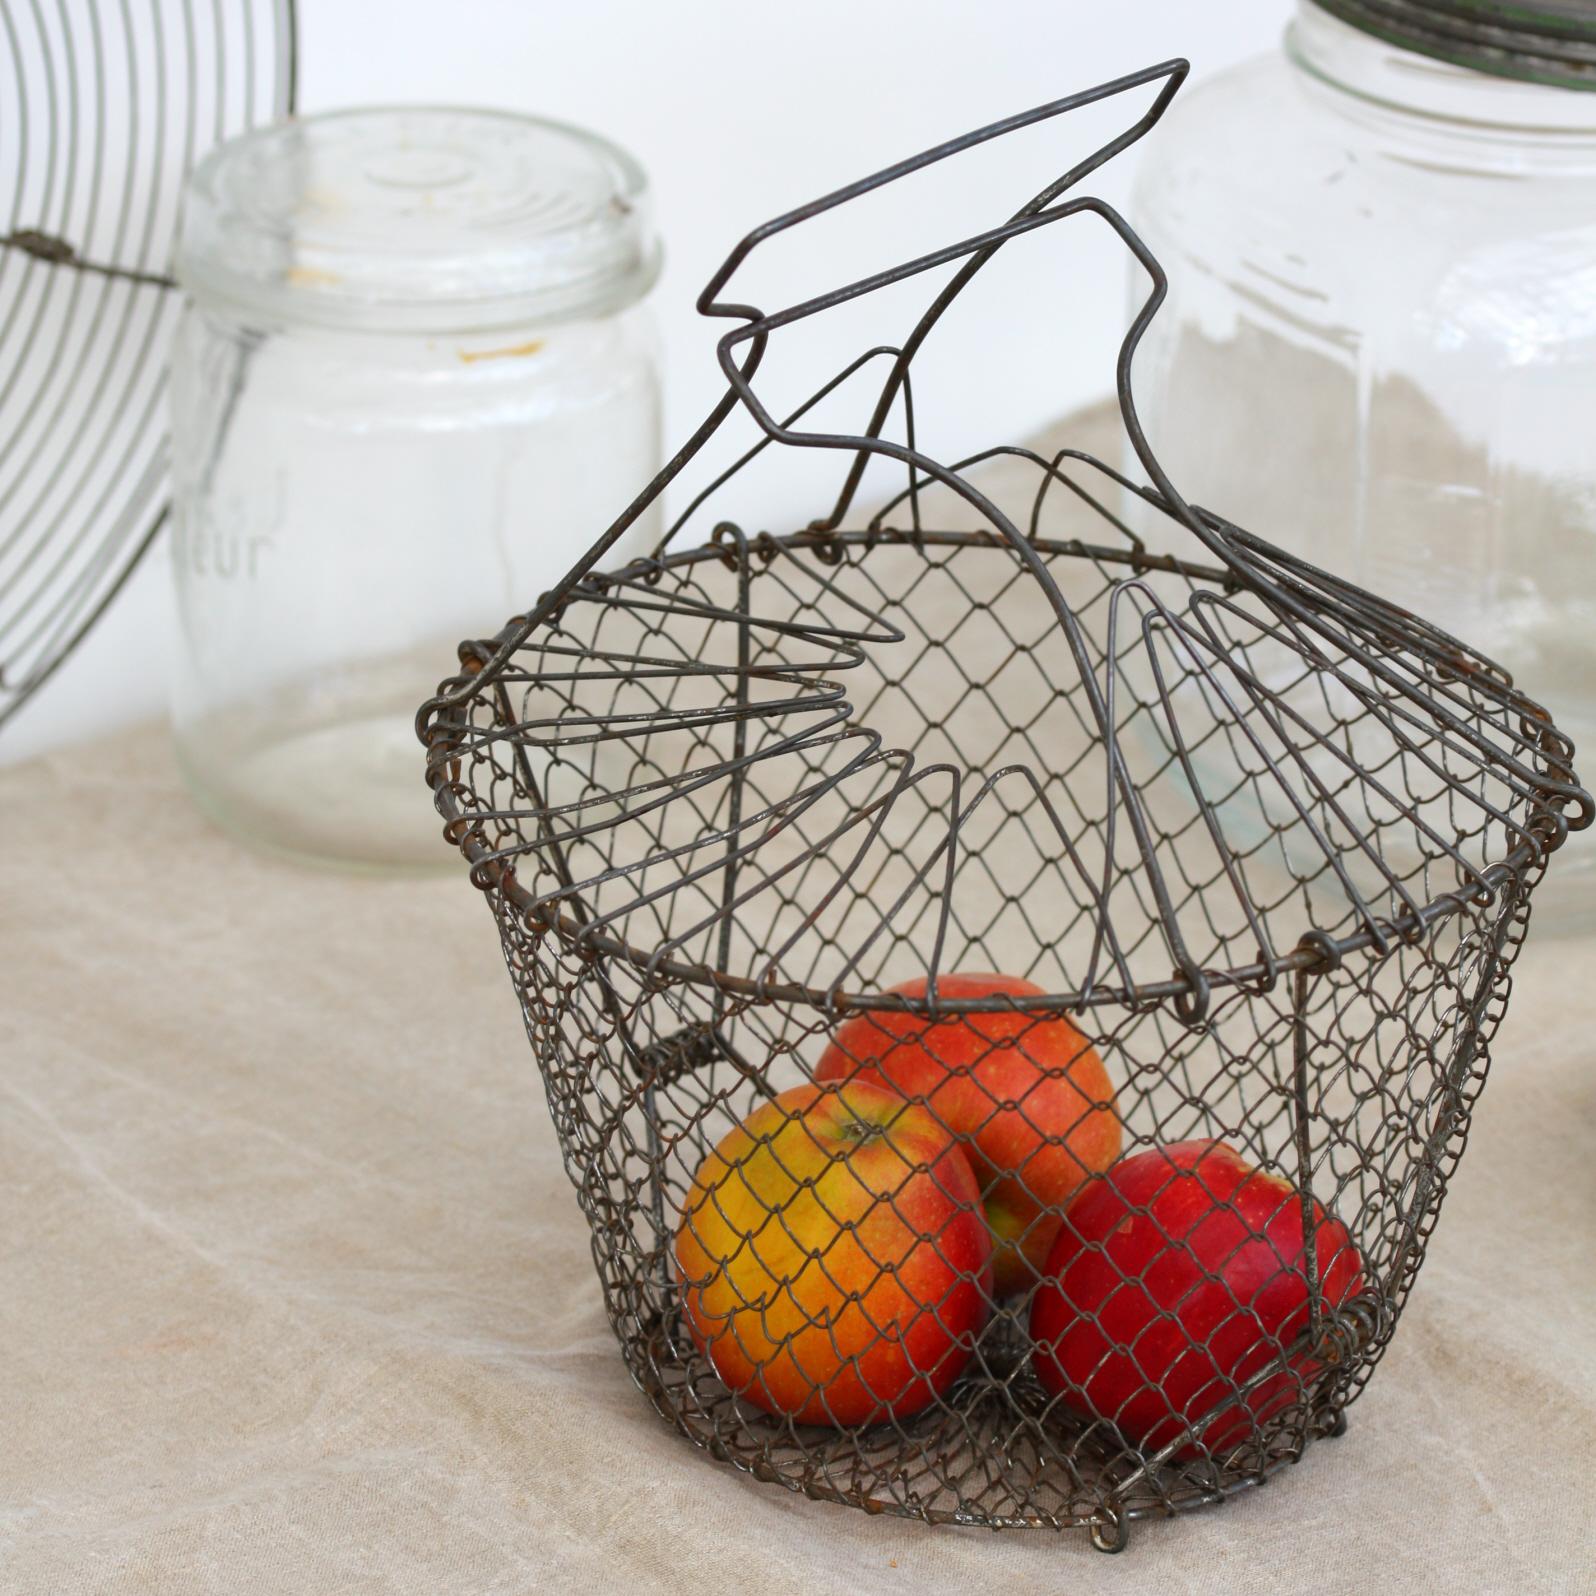 vintage french folding wire basket dee puddy. Black Bedroom Furniture Sets. Home Design Ideas